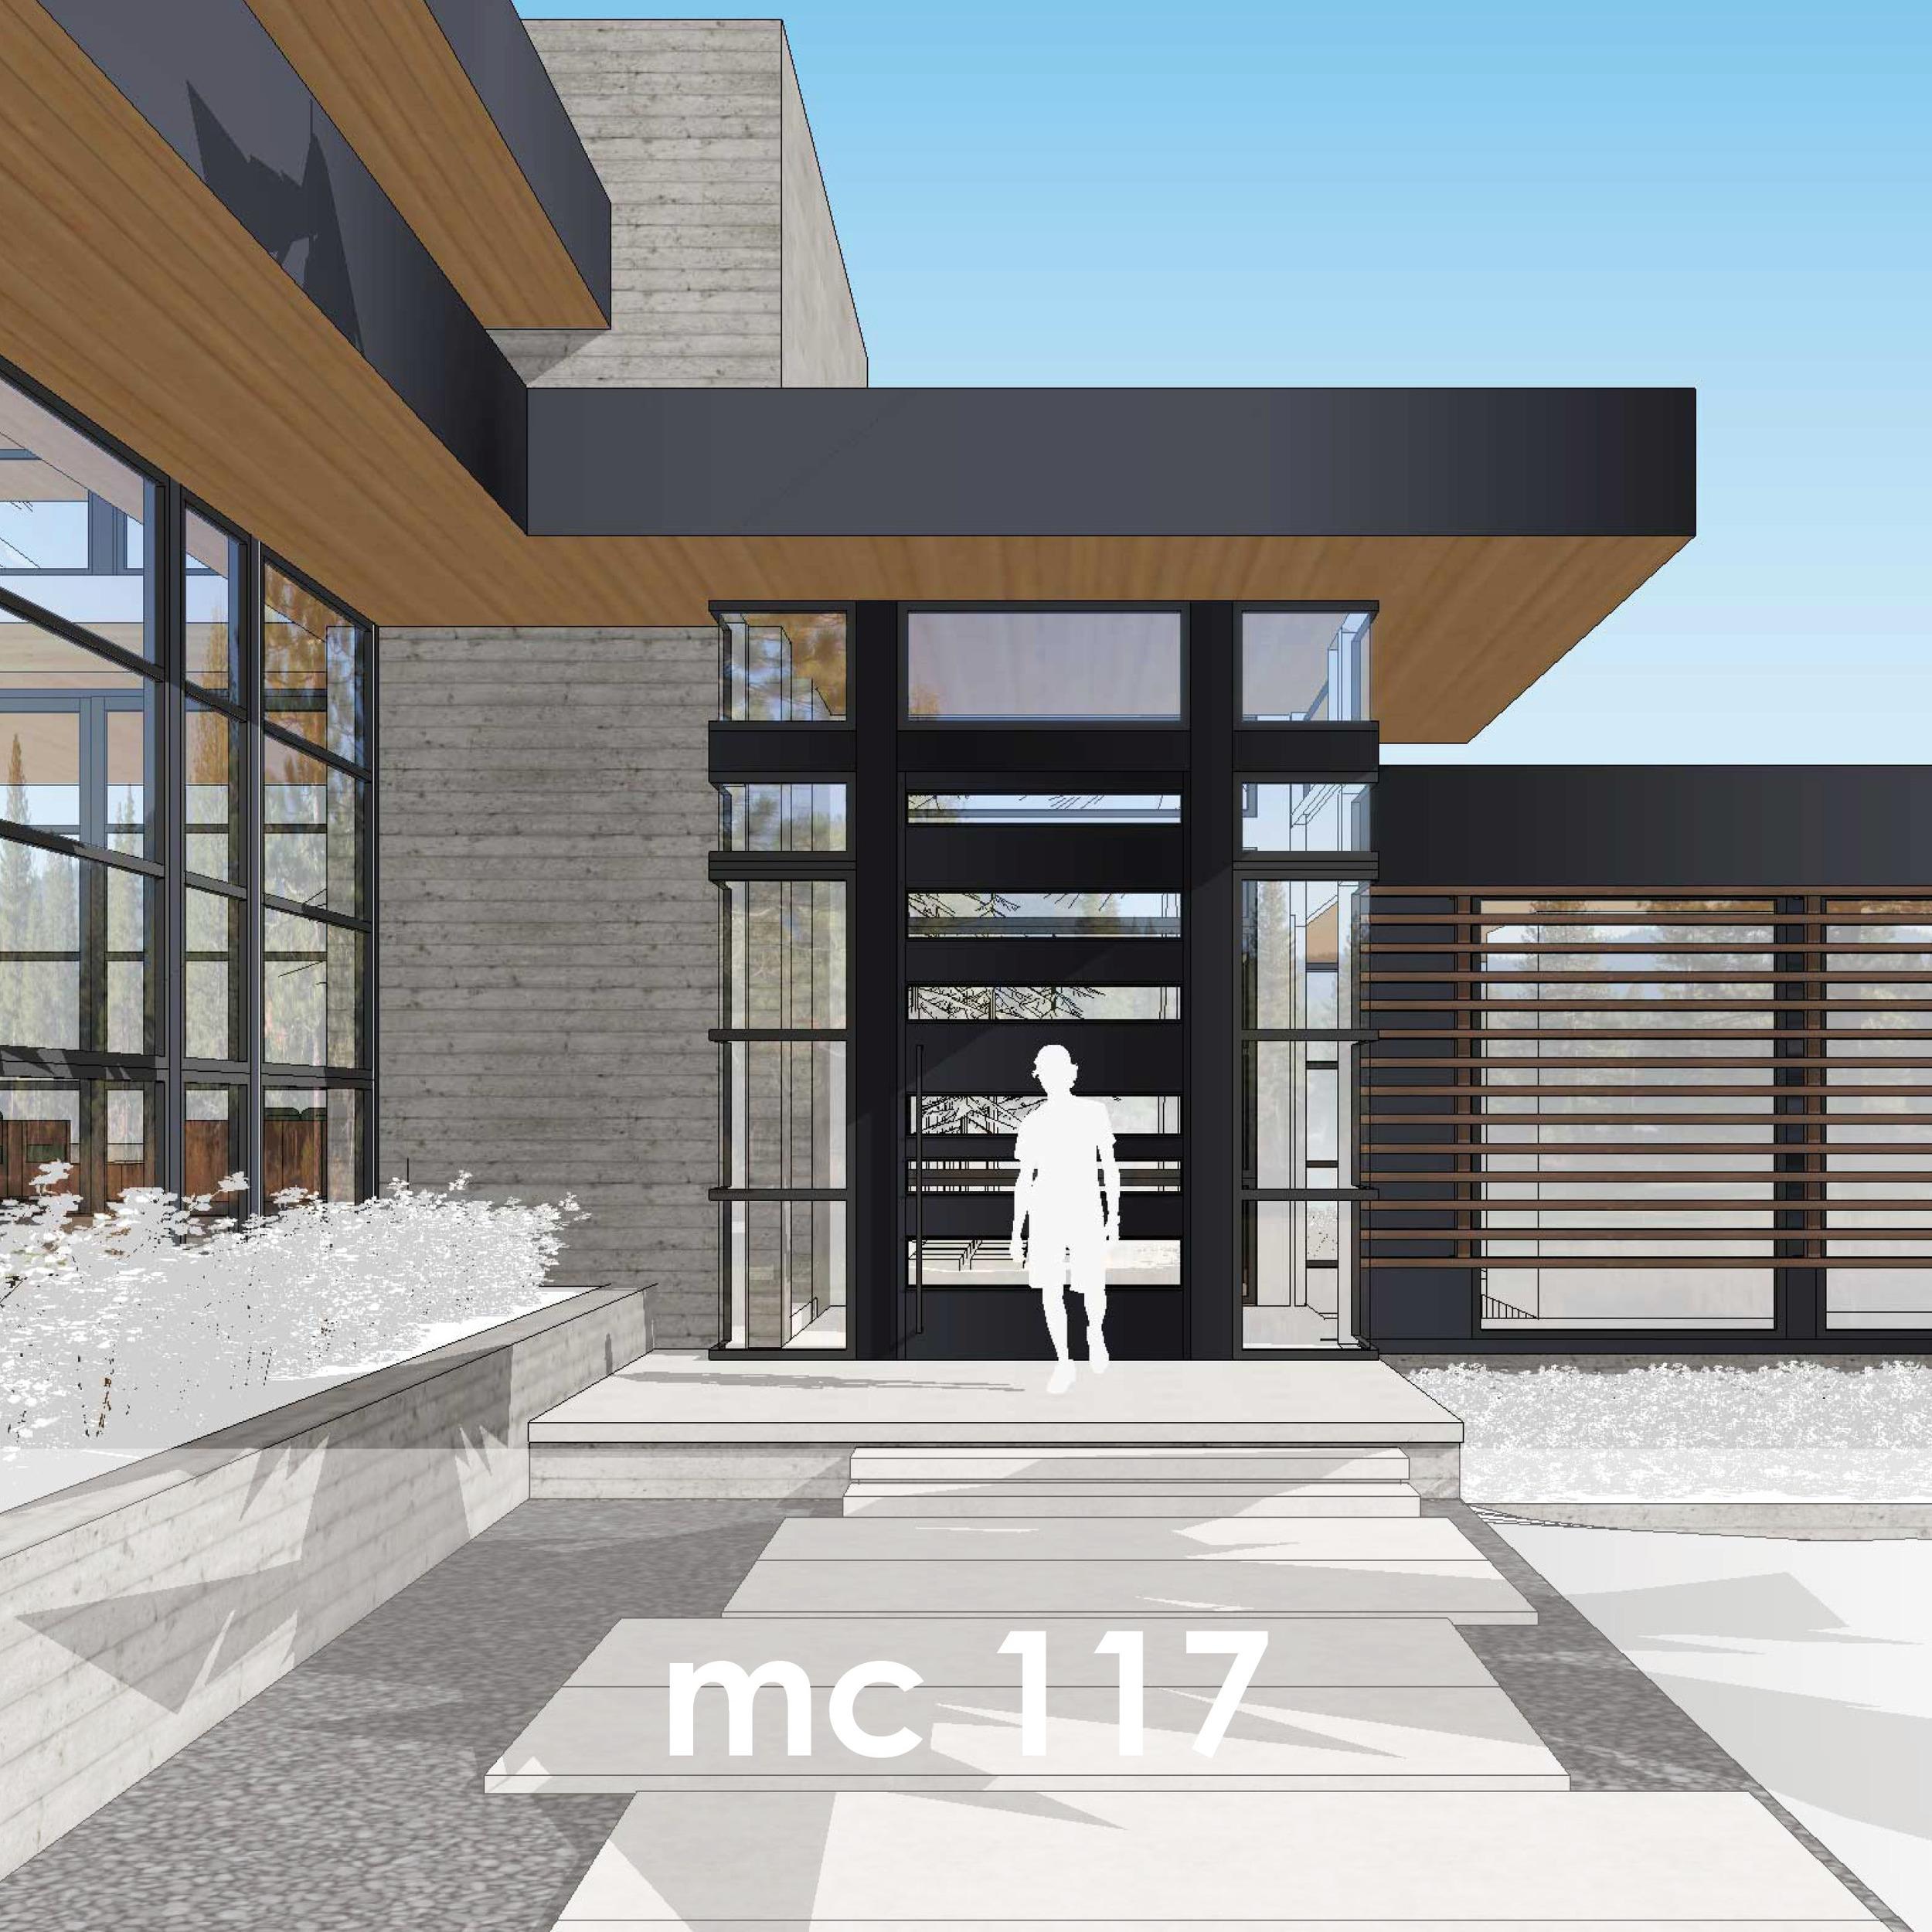 mc-117-mossy.jpg